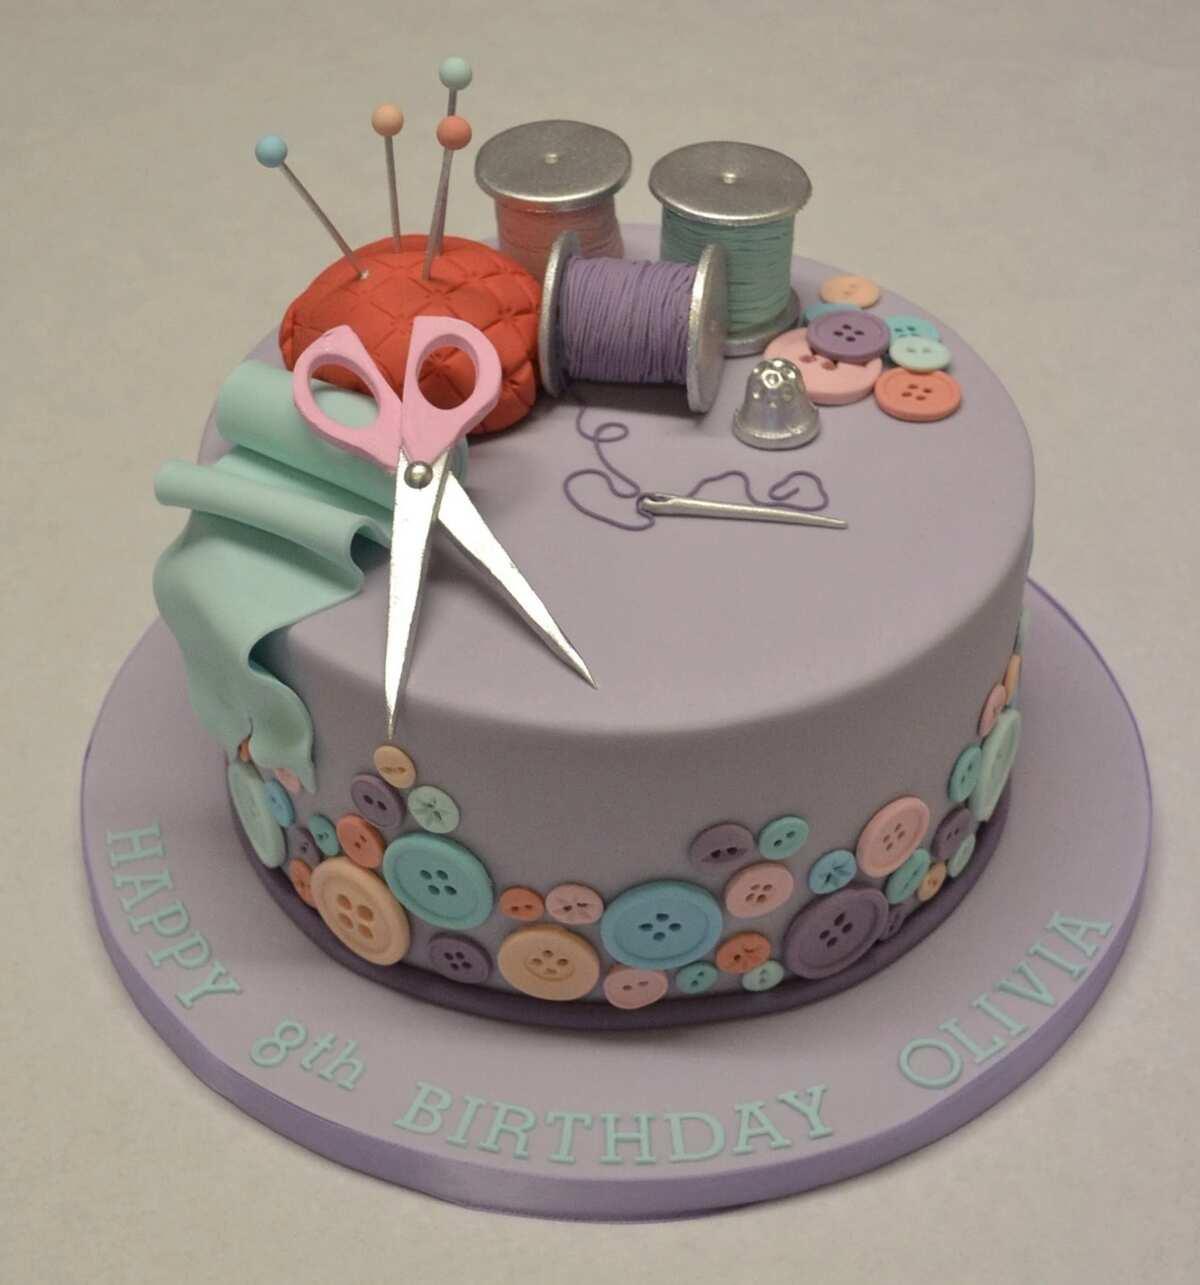 Birthday cake for girls 11 cute designs ▷ Legit.ng